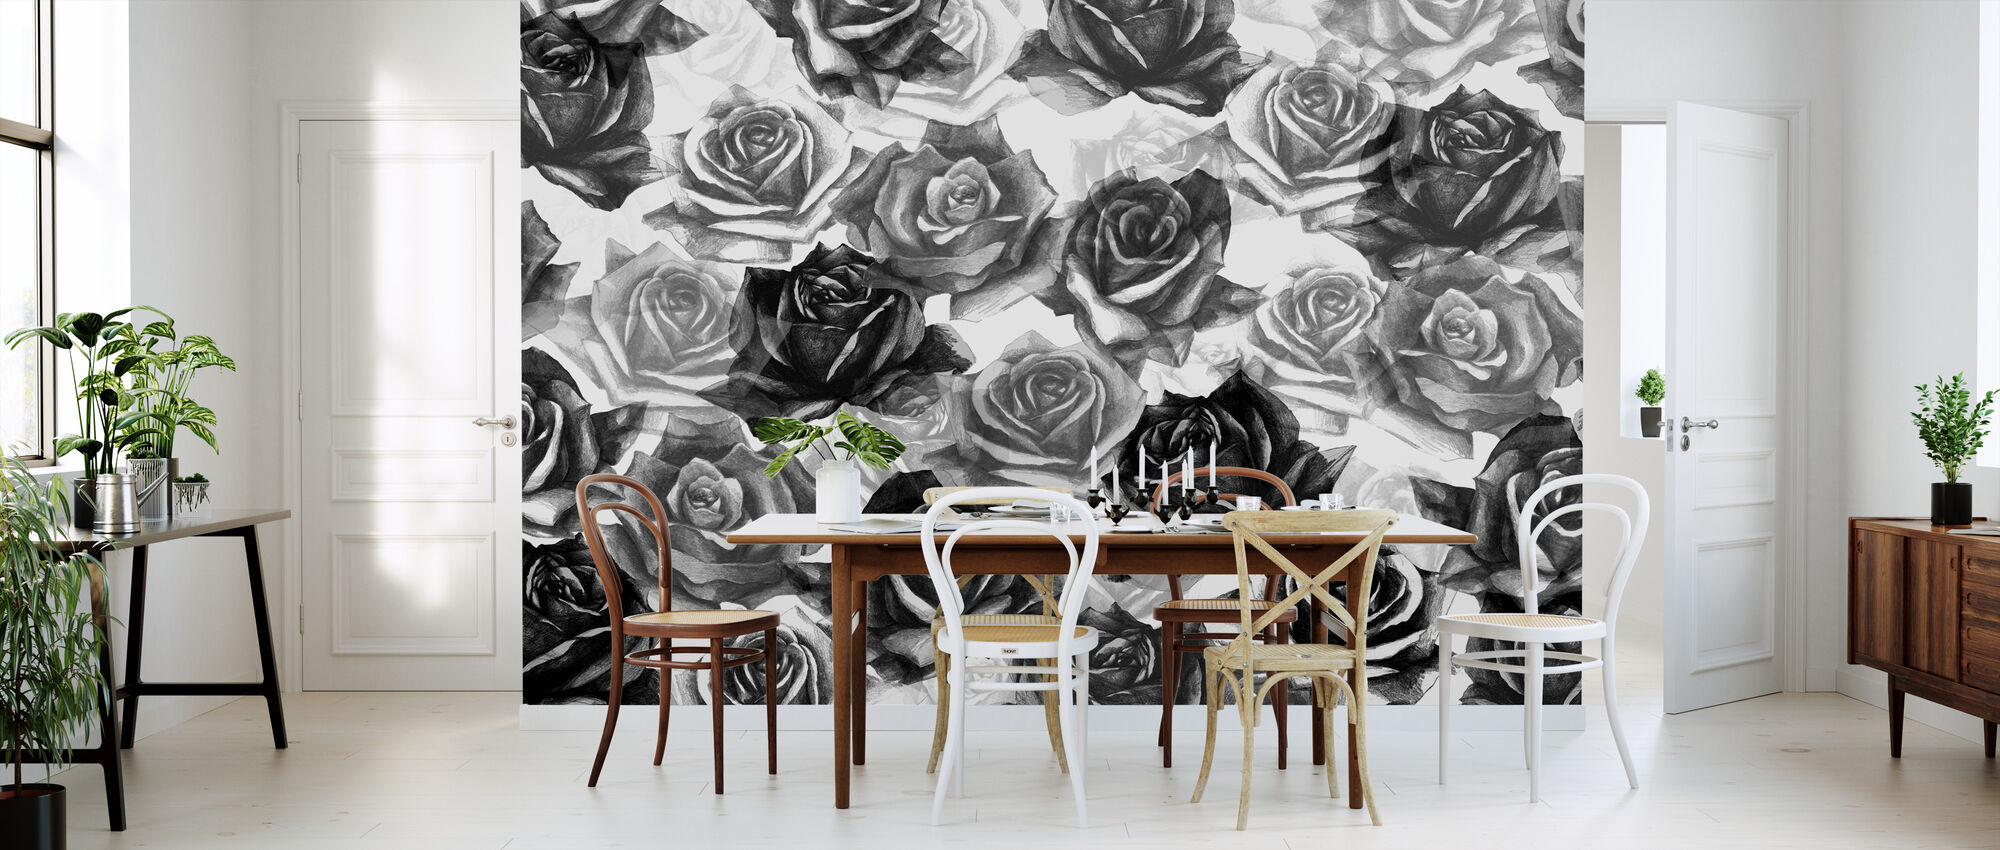 Mis rosas negras - Papel pintado - Cocina